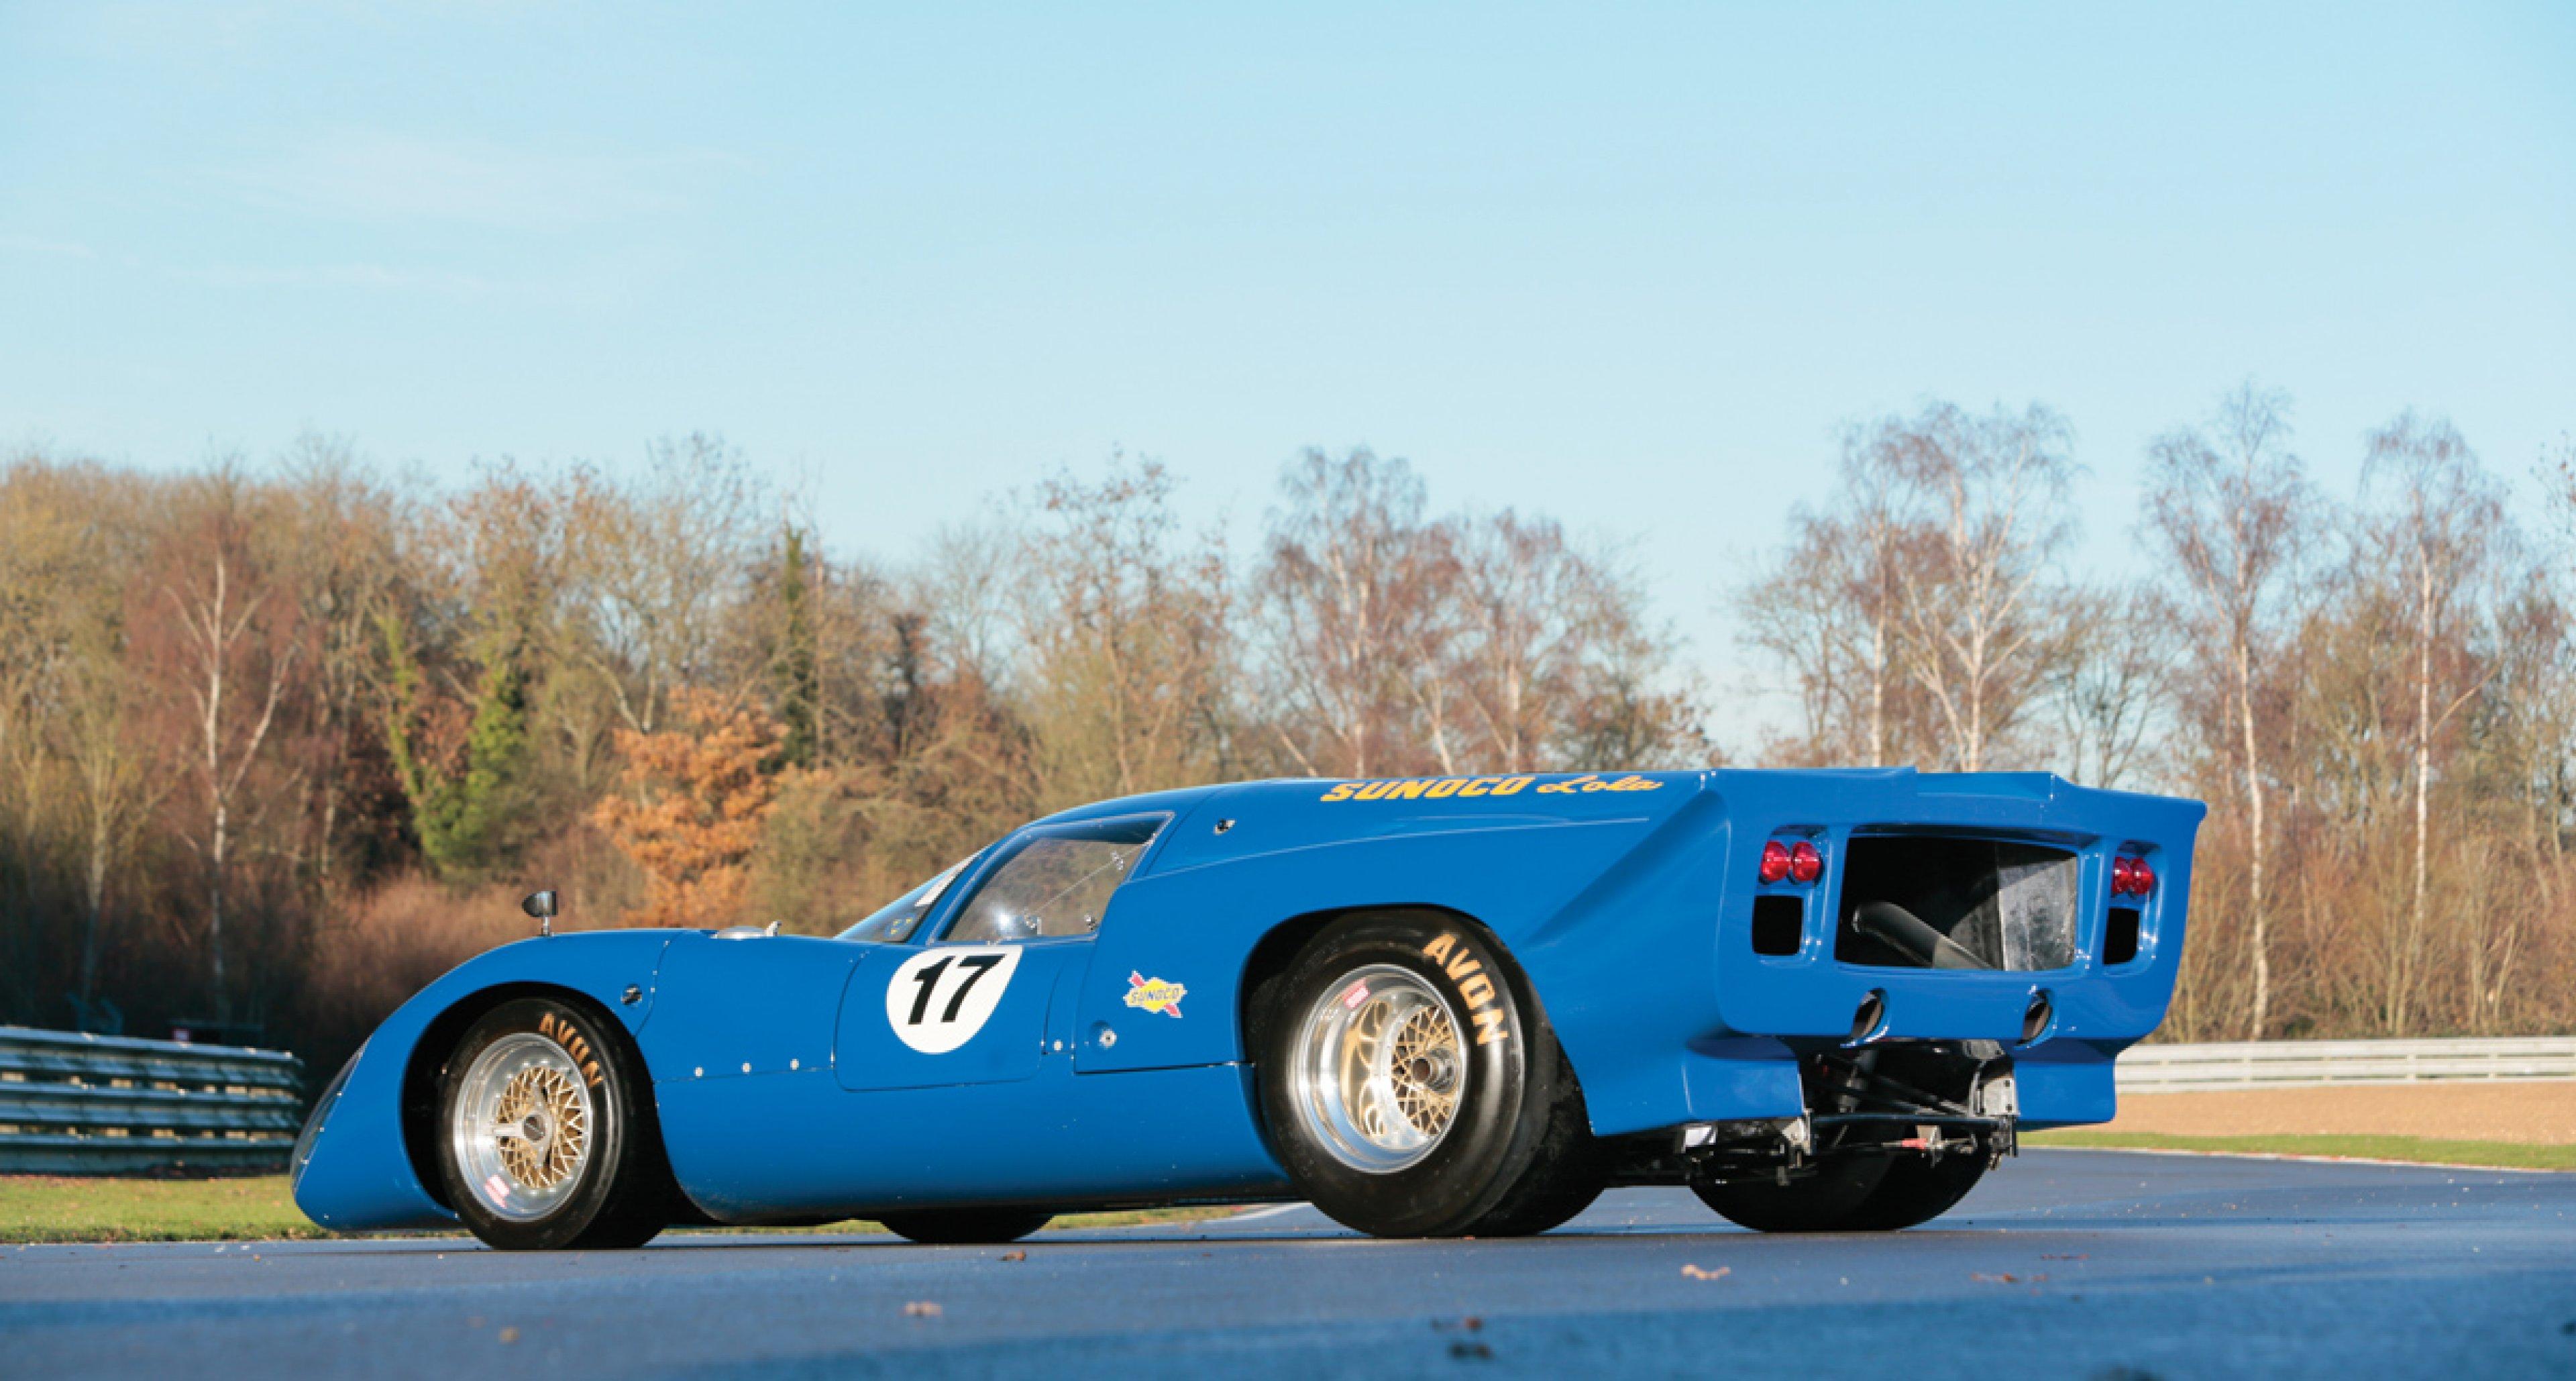 Lot 26: 1969 Lola T70 Mk IIIb by Sbarro € 295.000 - 355.000